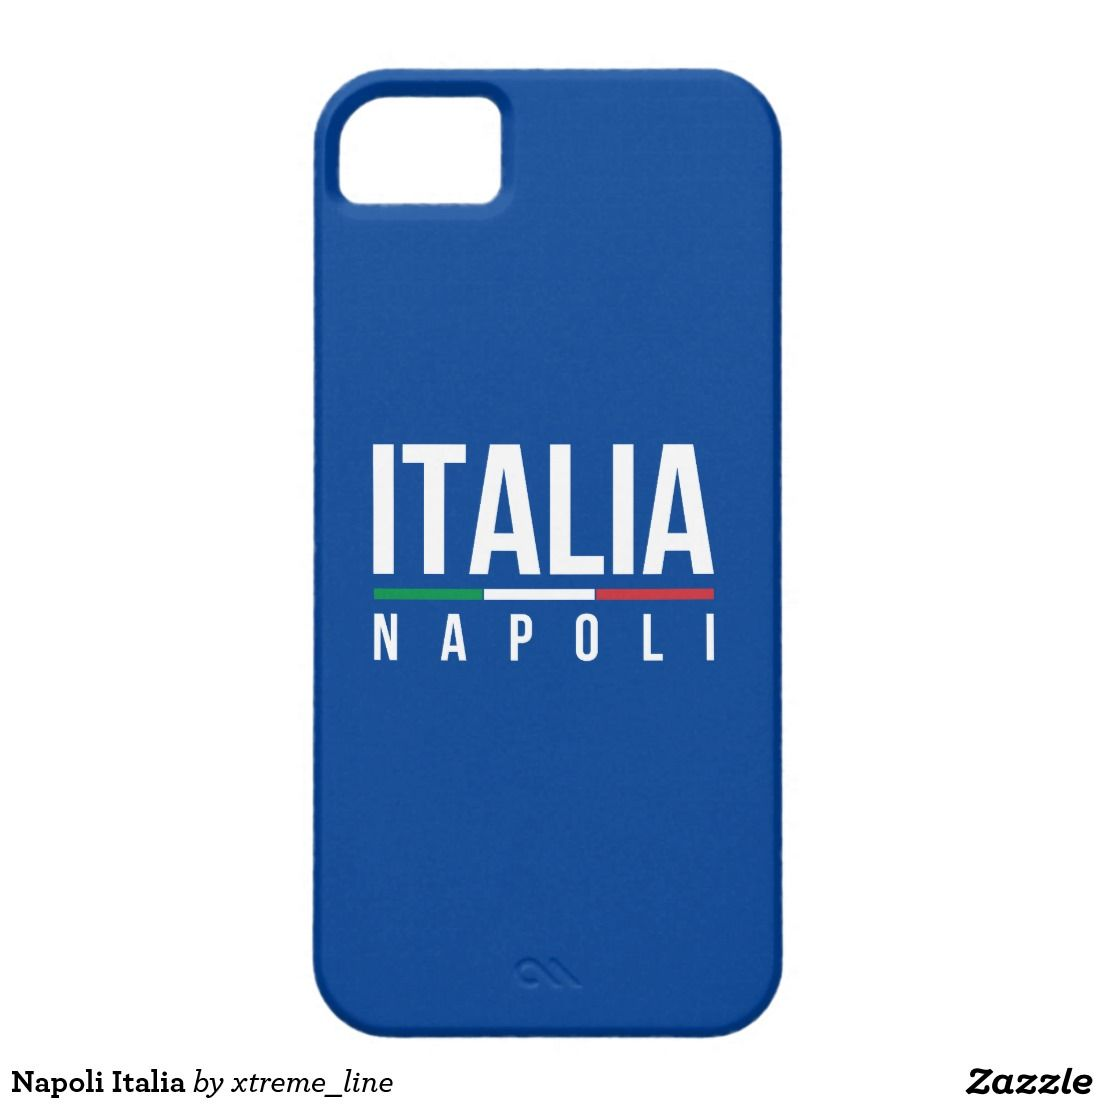 Napoli Italia iPhone 5 Cover.